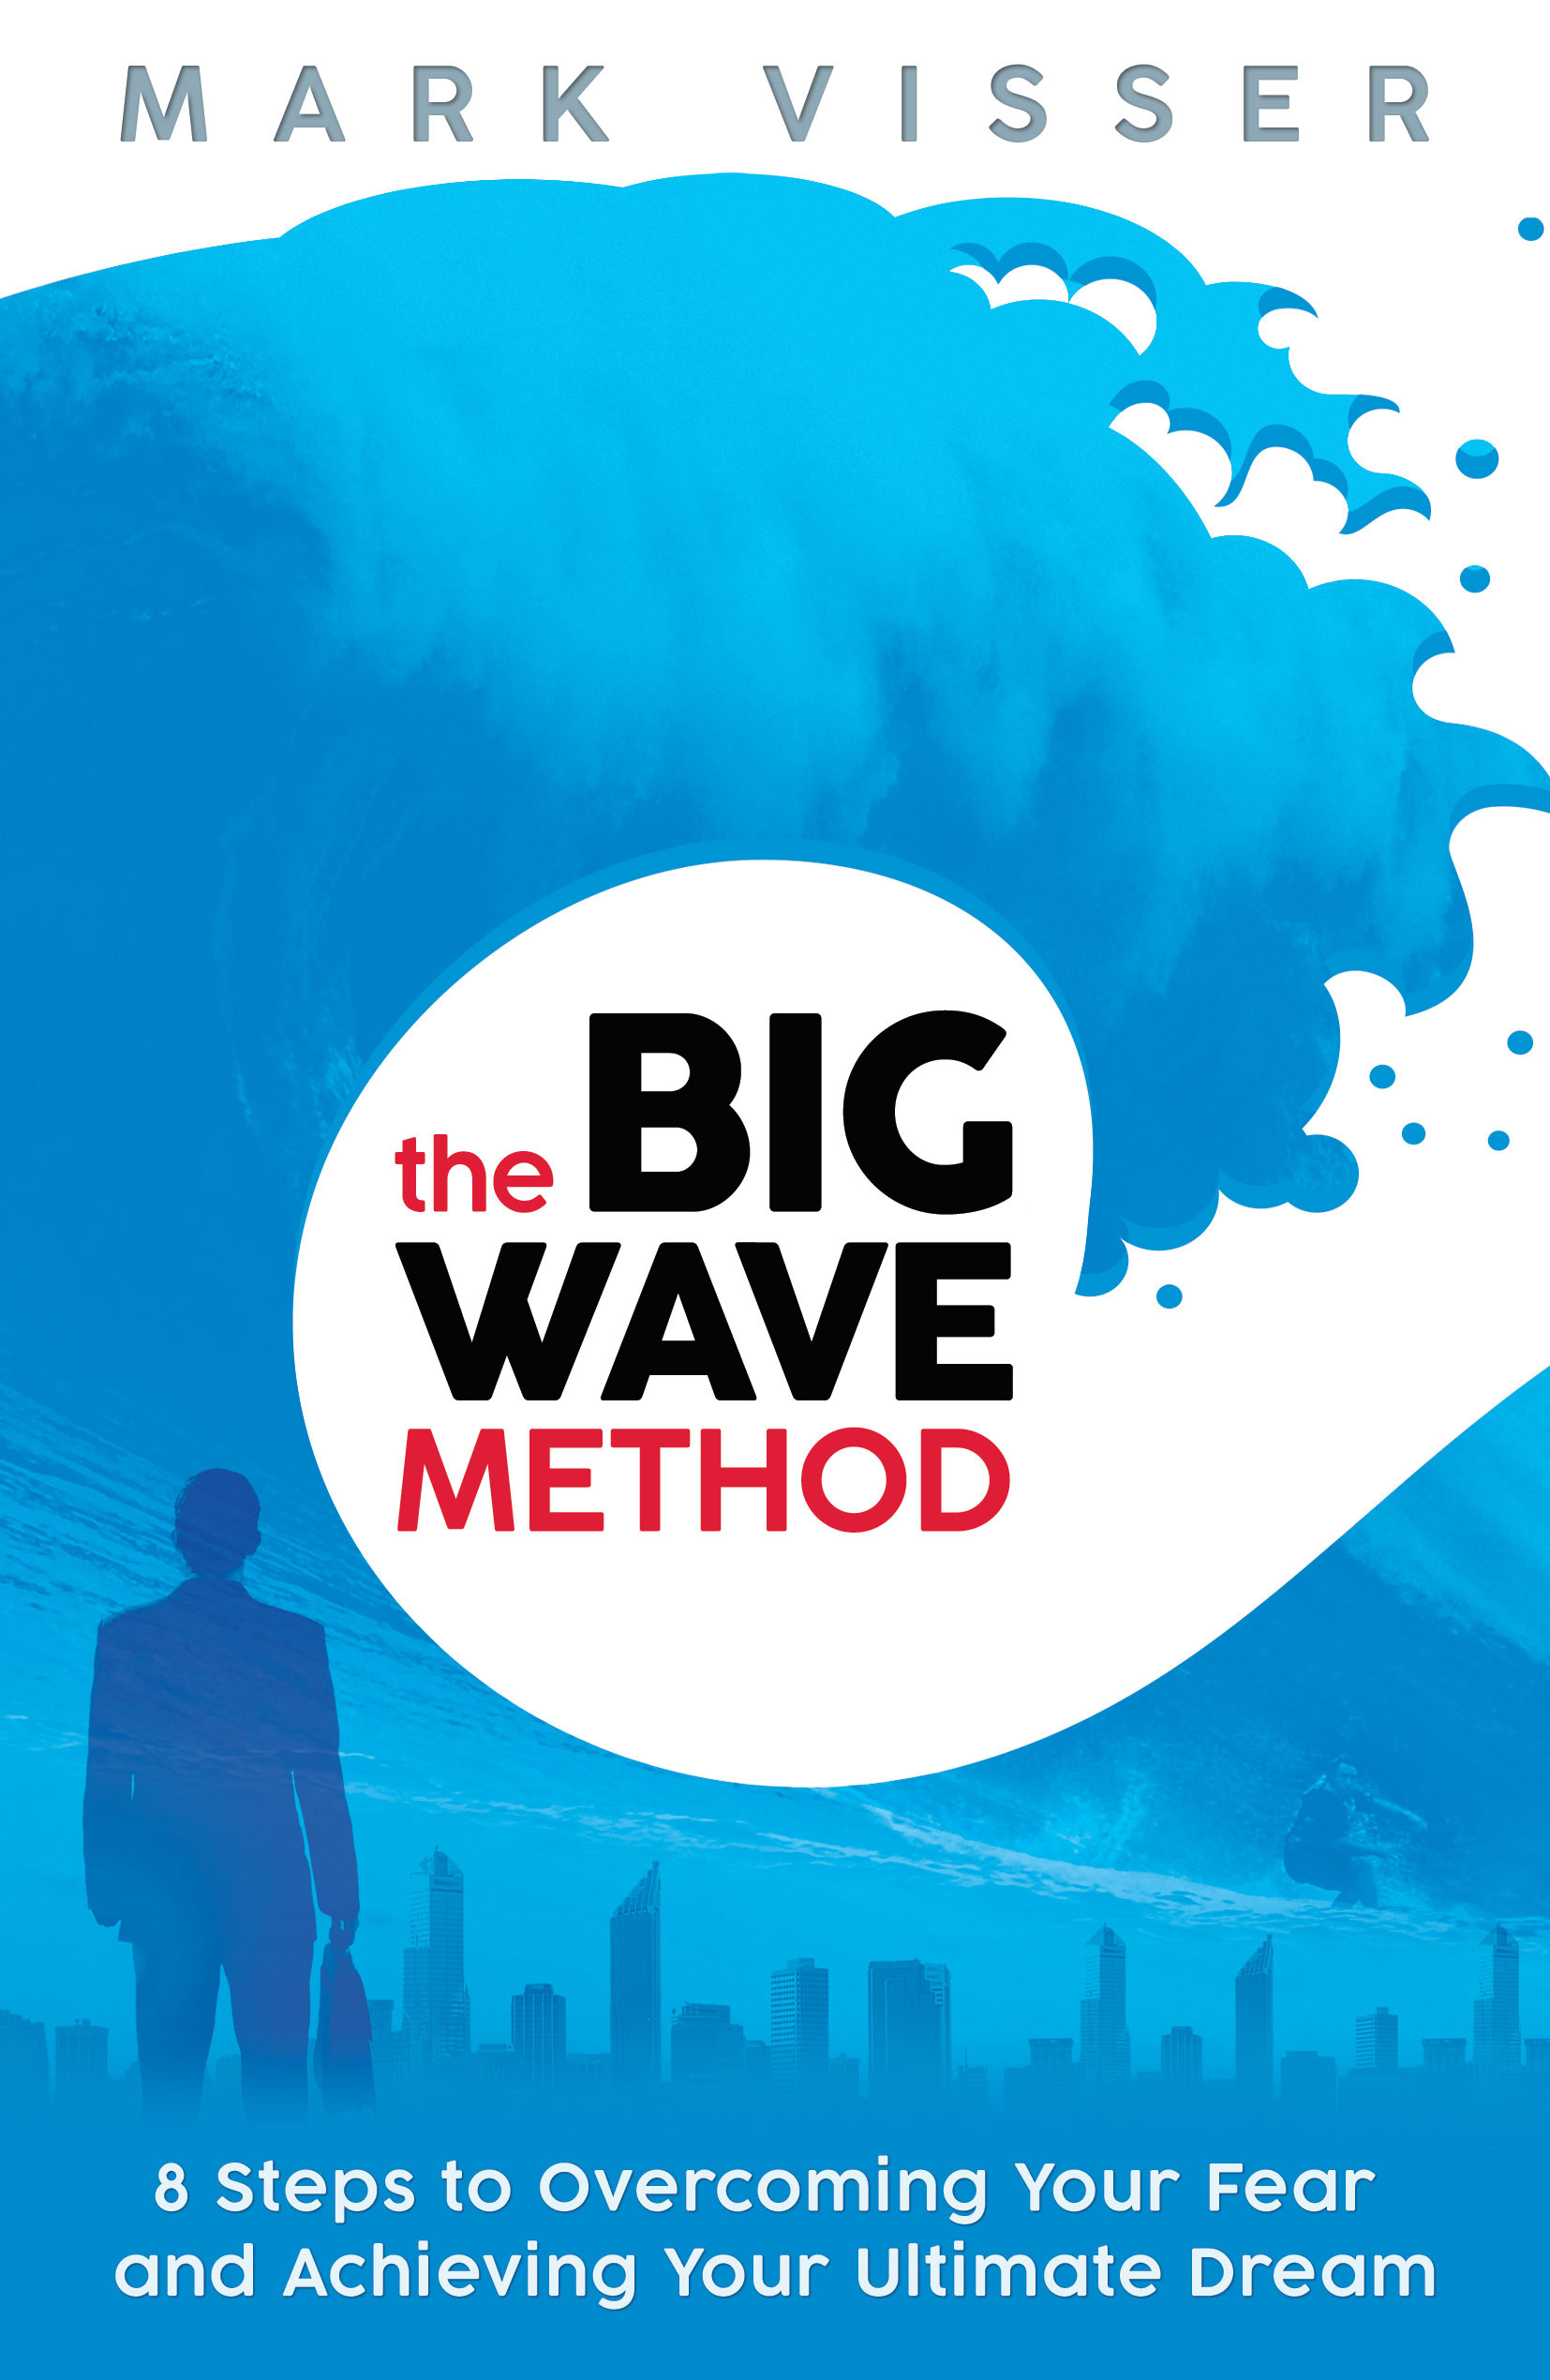 Big-Wave-Method.jpg